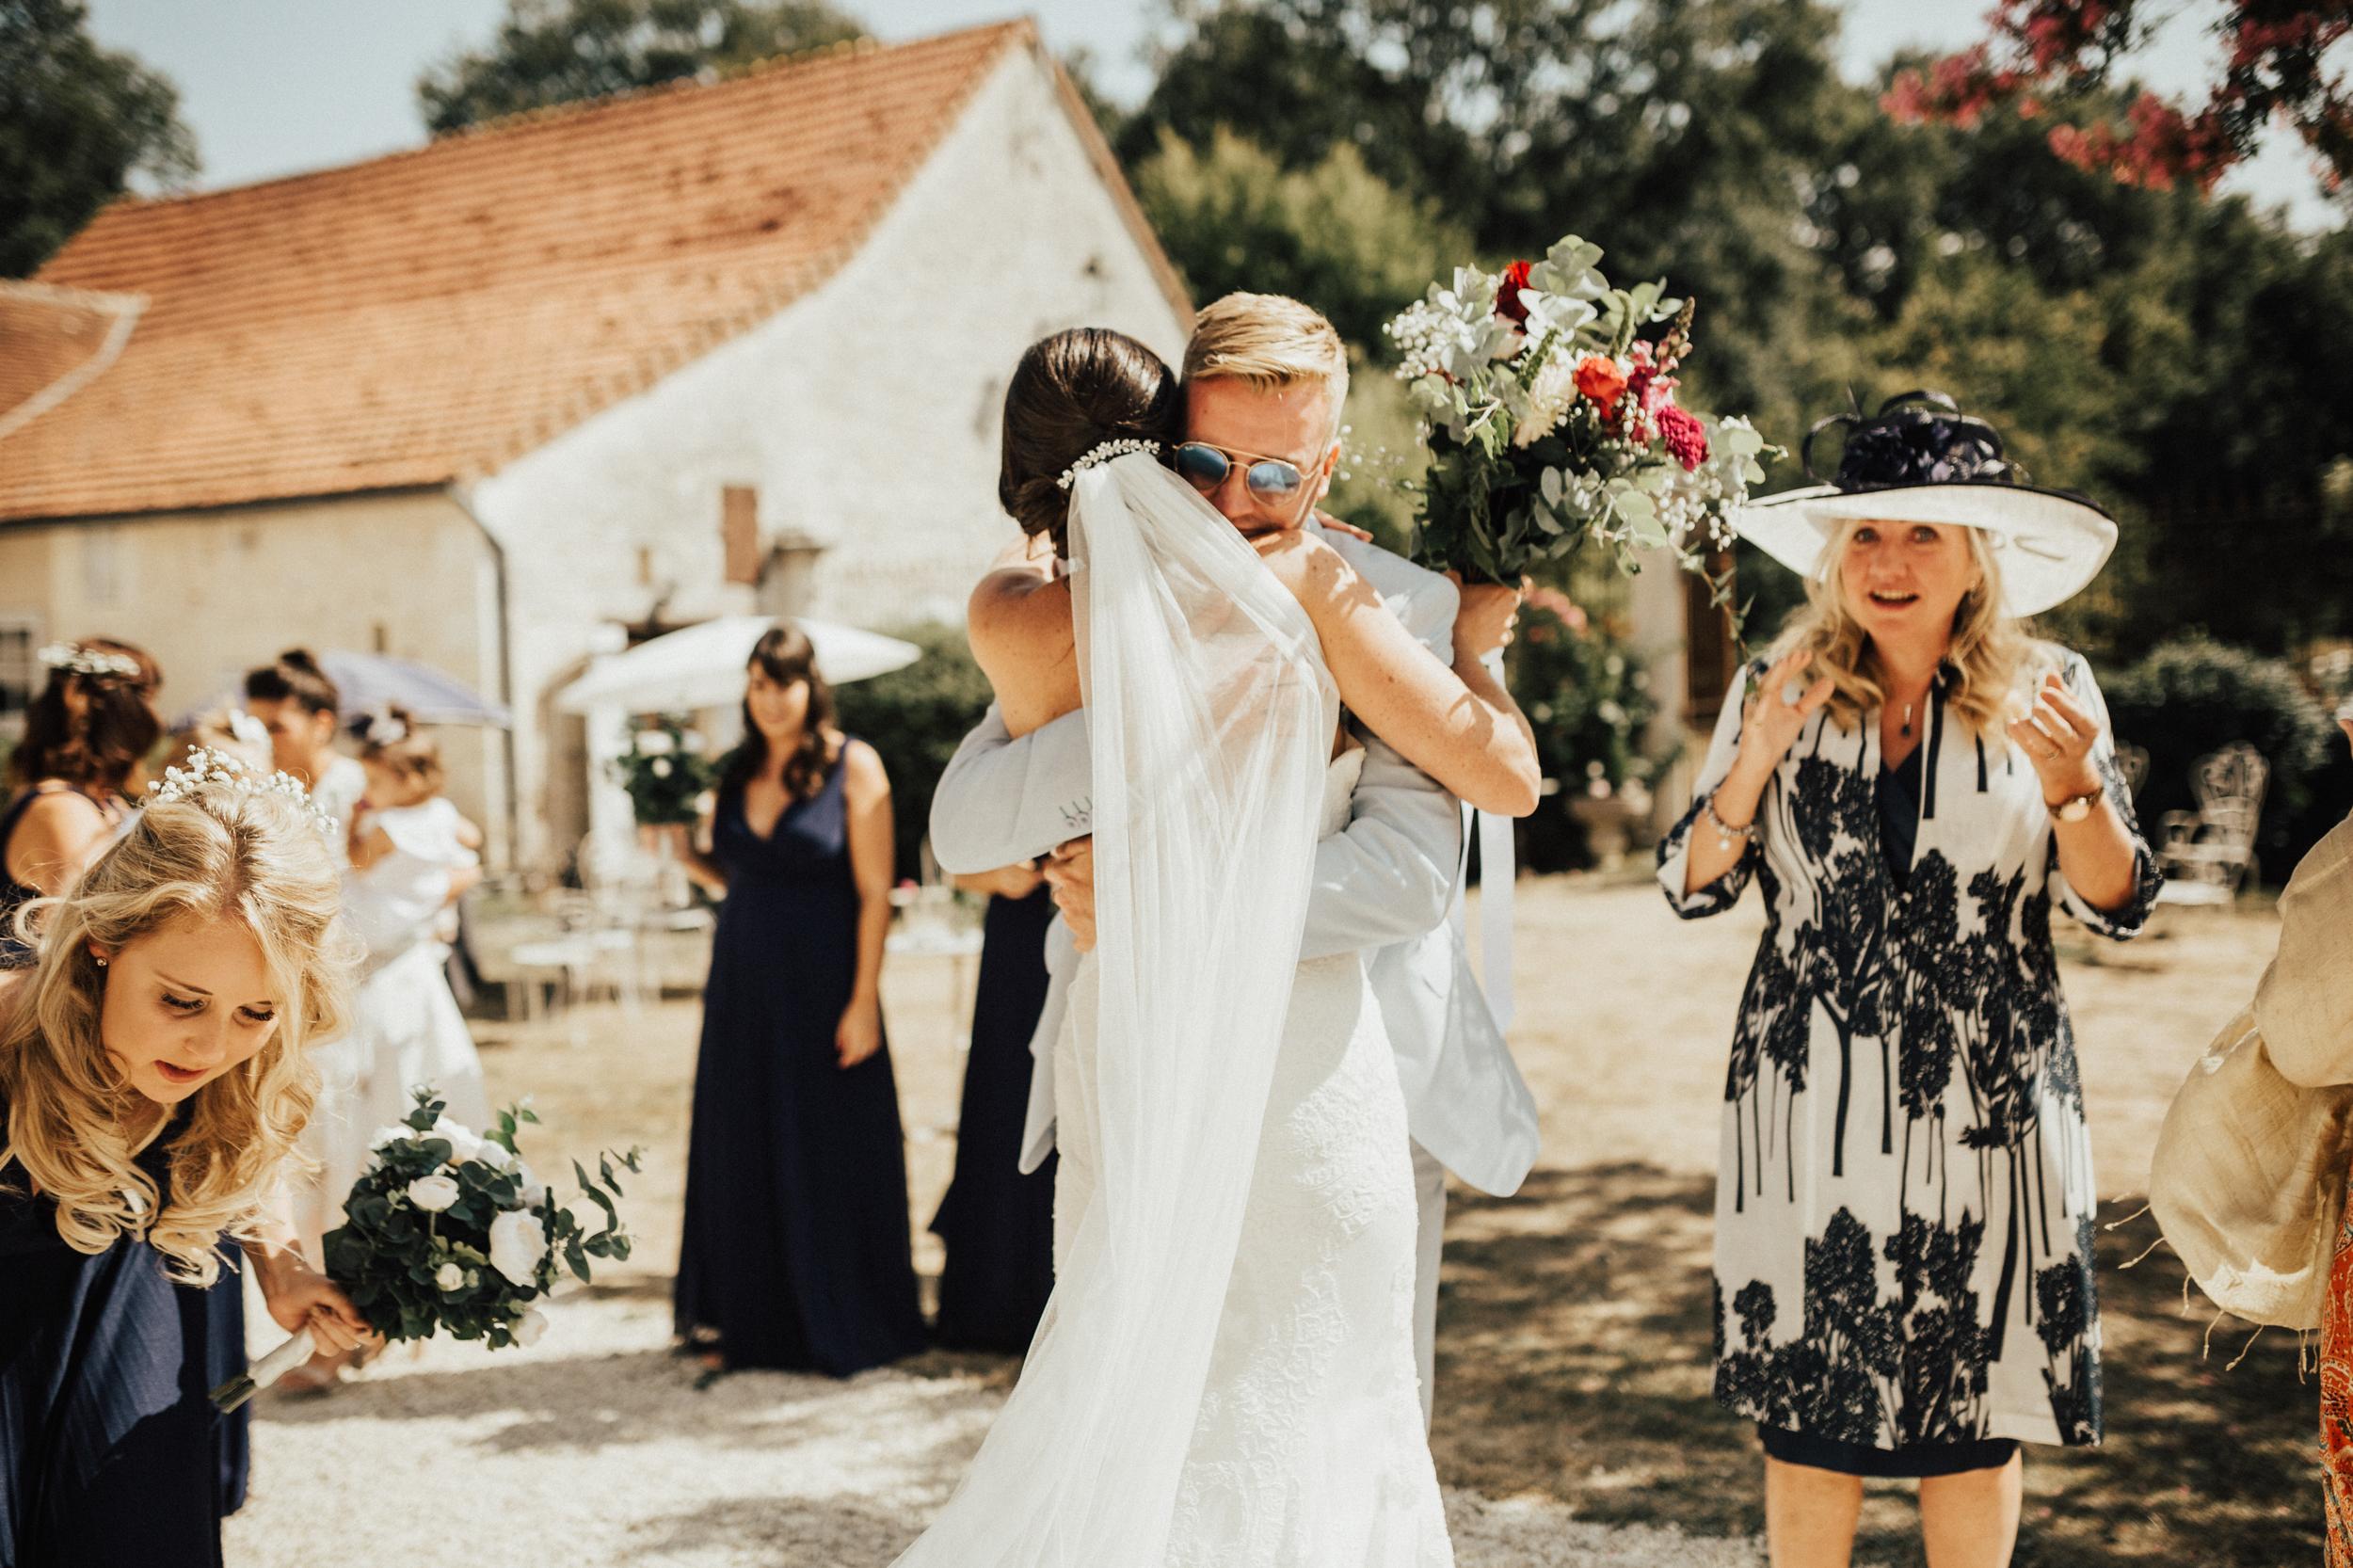 Amy-Zac-Destination-Wedding-France-Manoir-Foulquetiere-Darina-Stoda-Photography-37.jpg